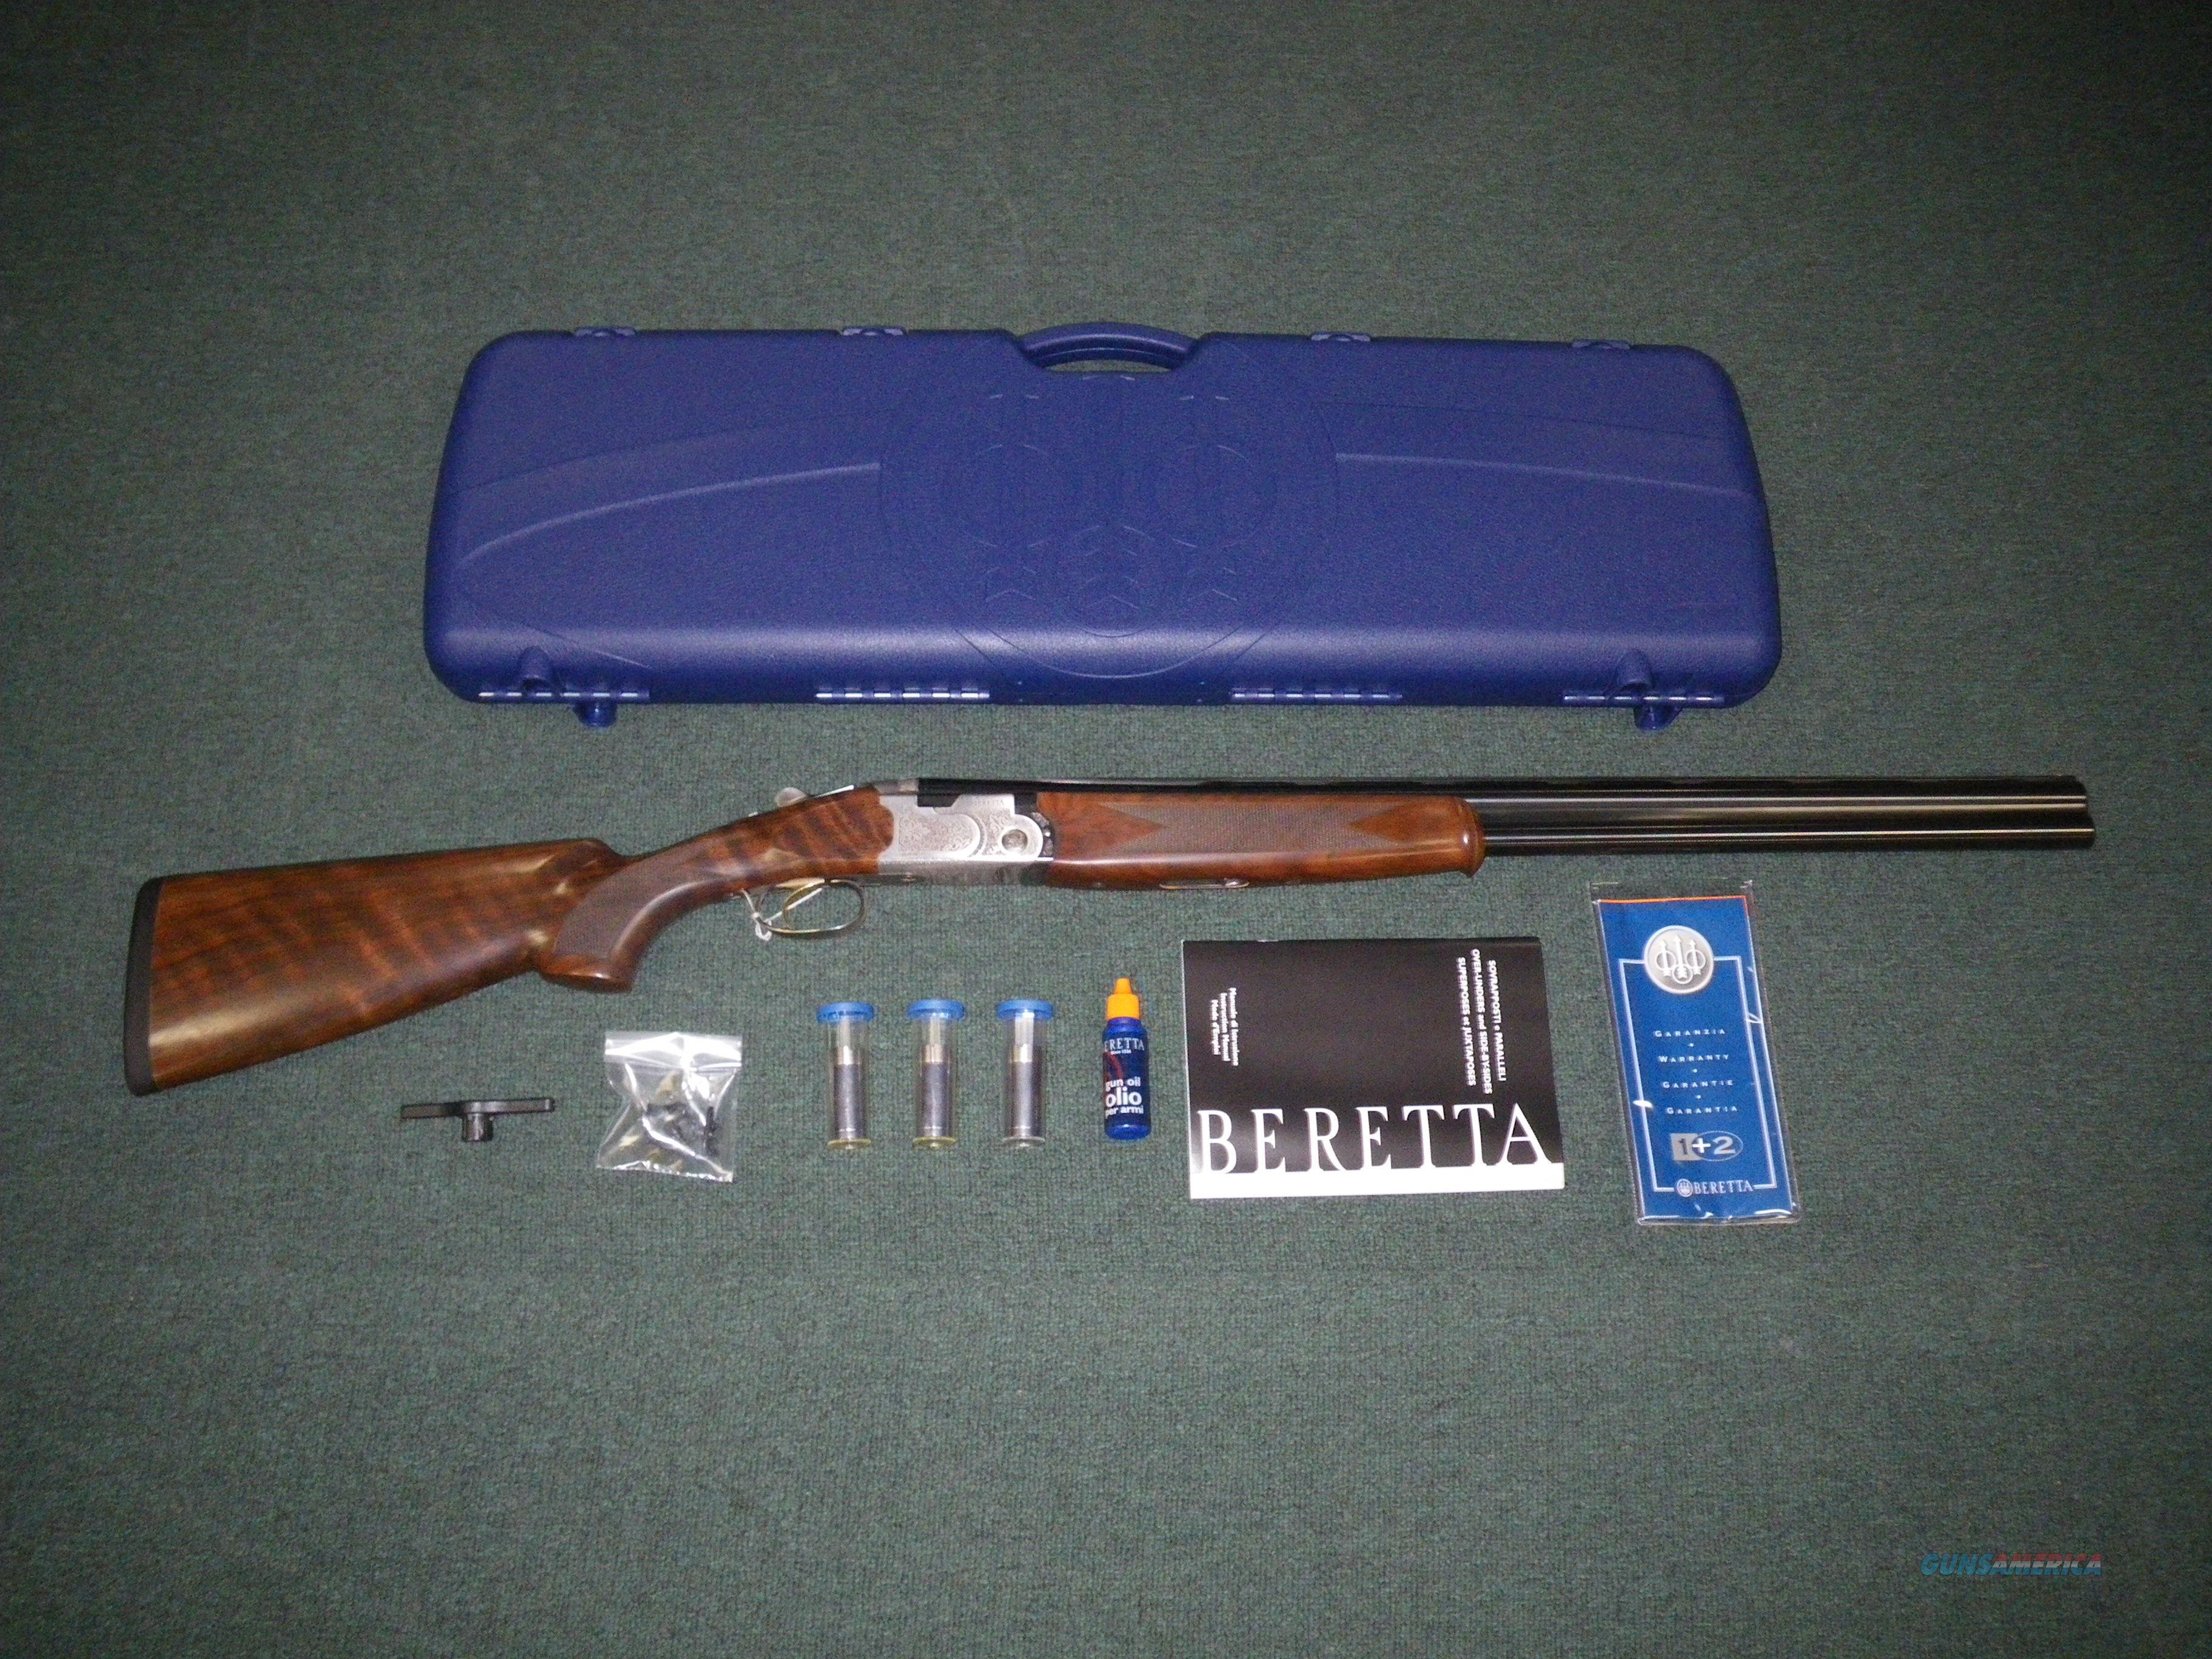 "Beretta 686 Silver Pigeon I 12ga 26"" Over Under J6863J6  Guns > Shotguns > Beretta Shotguns > O/U > Hunting"